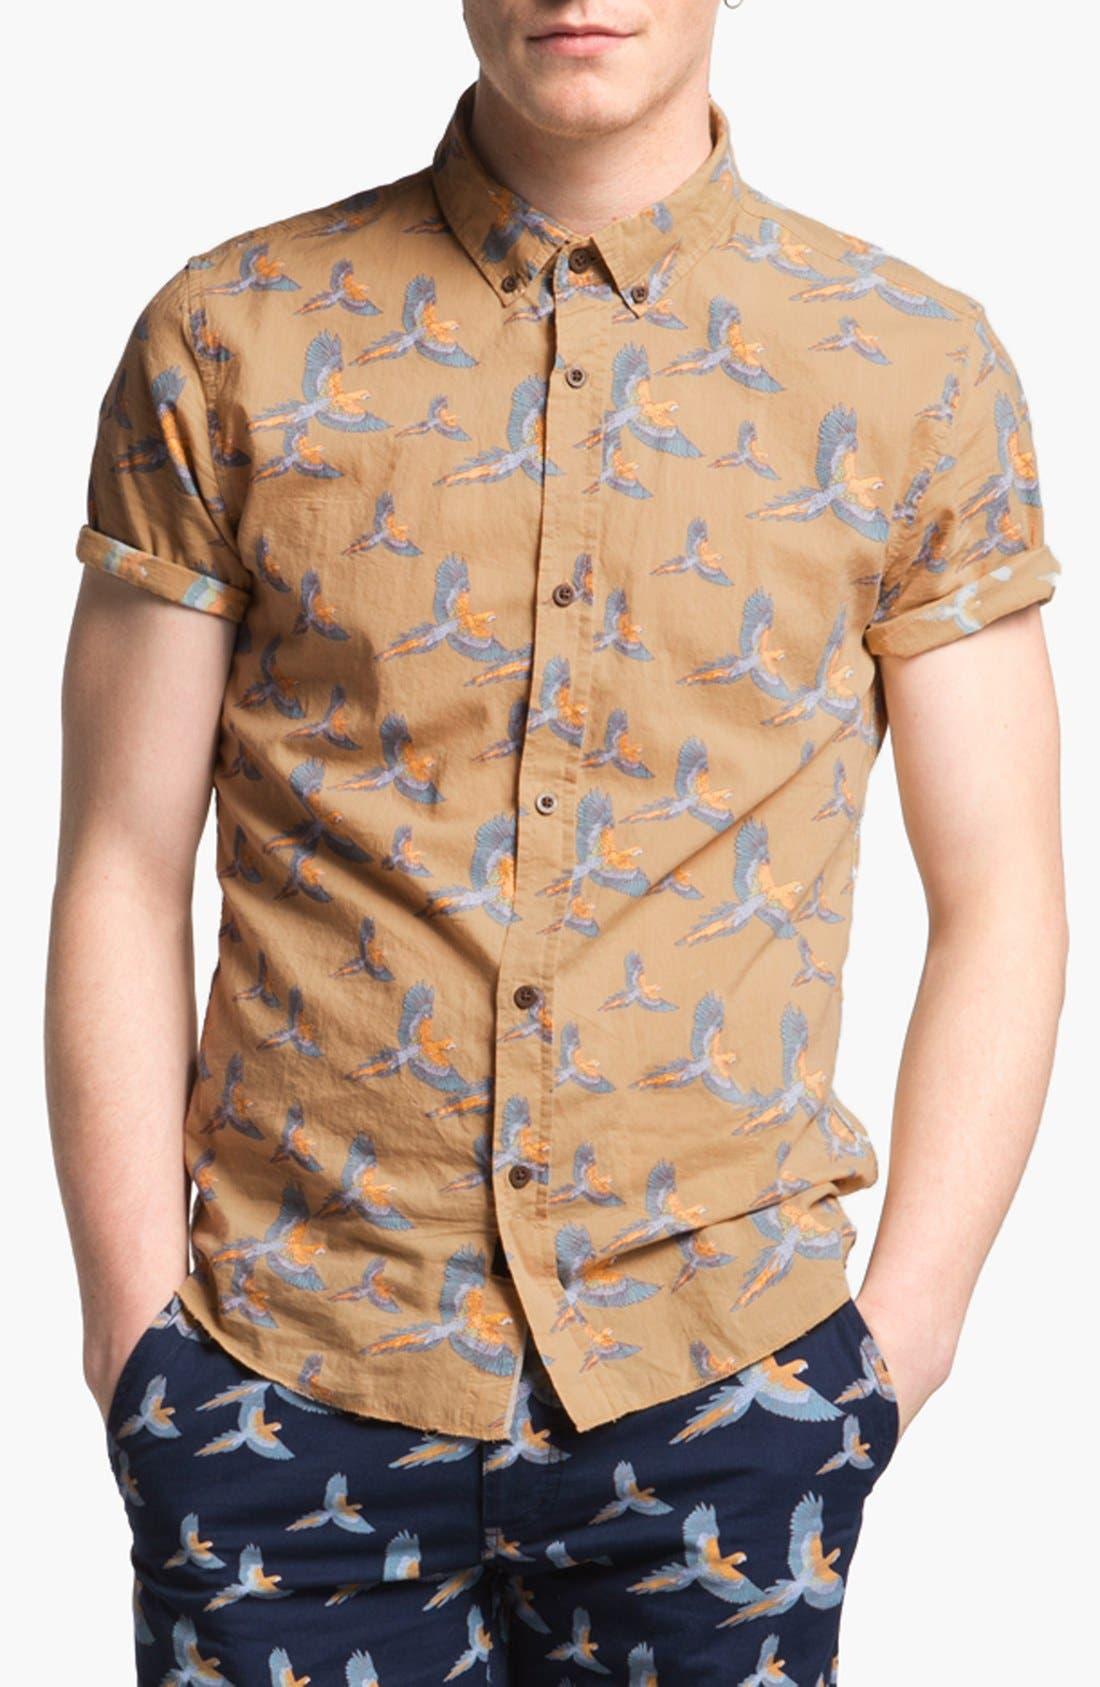 Alternate Image 1 Selected - ZANEROBE Print Woven Shirt